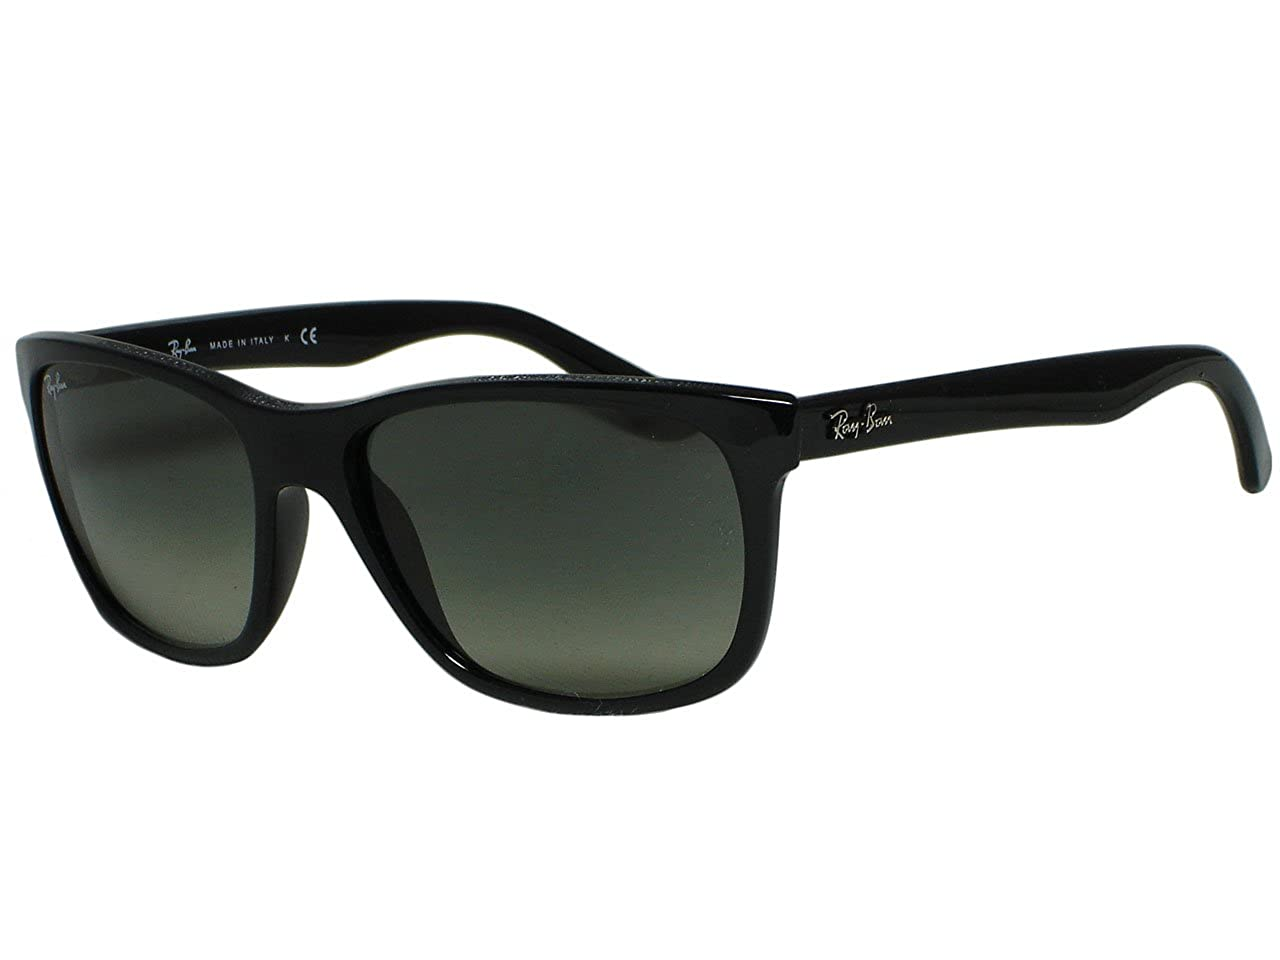 36e0cf4b1d Amazon.com  Ray Ban RB4181 601 71 Black Sunglasses 57mm  Clothing